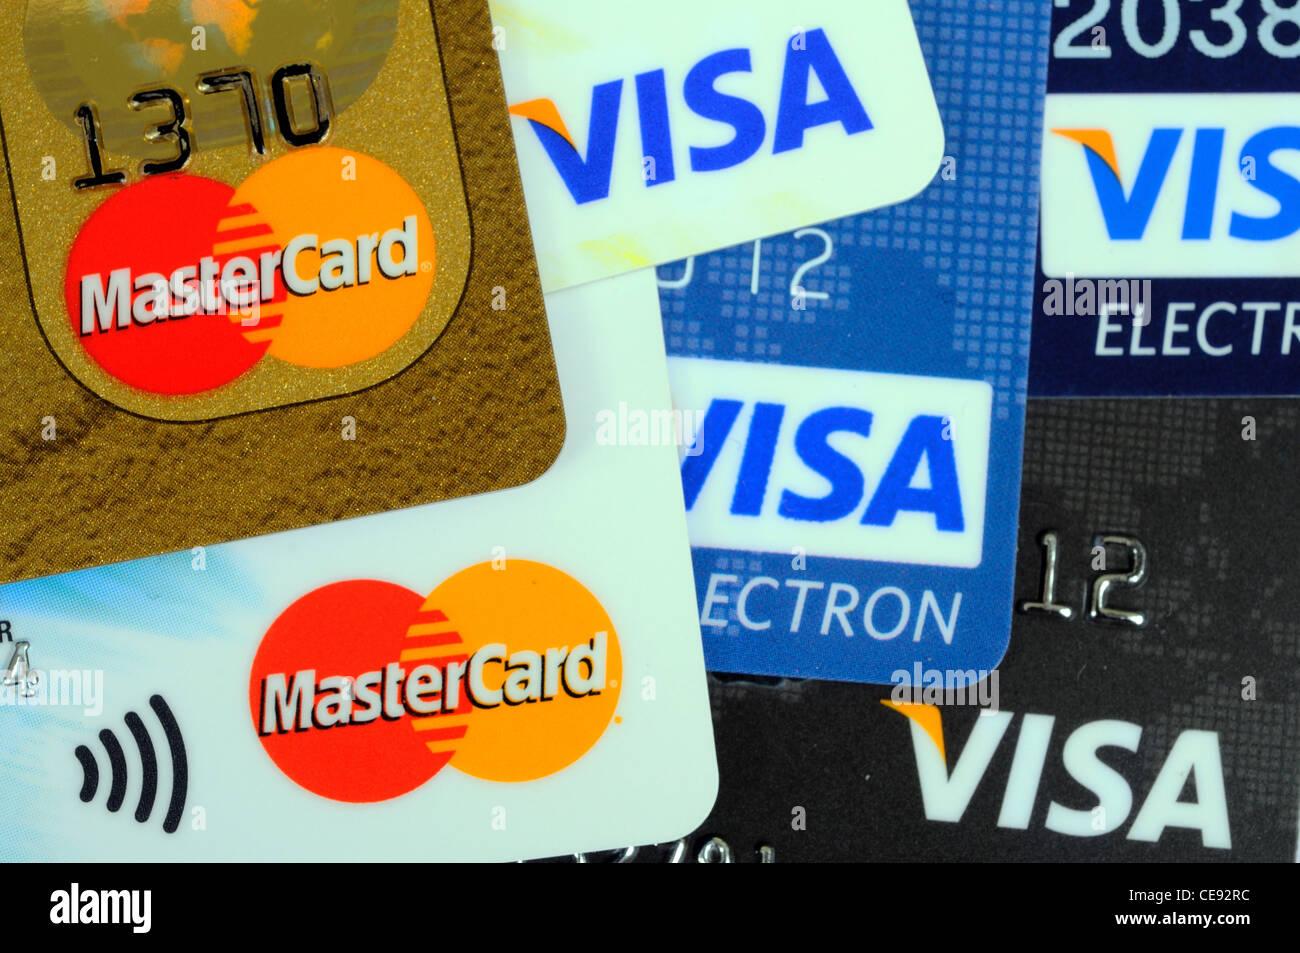 Carte Visa Angleterre.Les Cartes Visa Et Mastercard Cartes De Credit Et De Debit